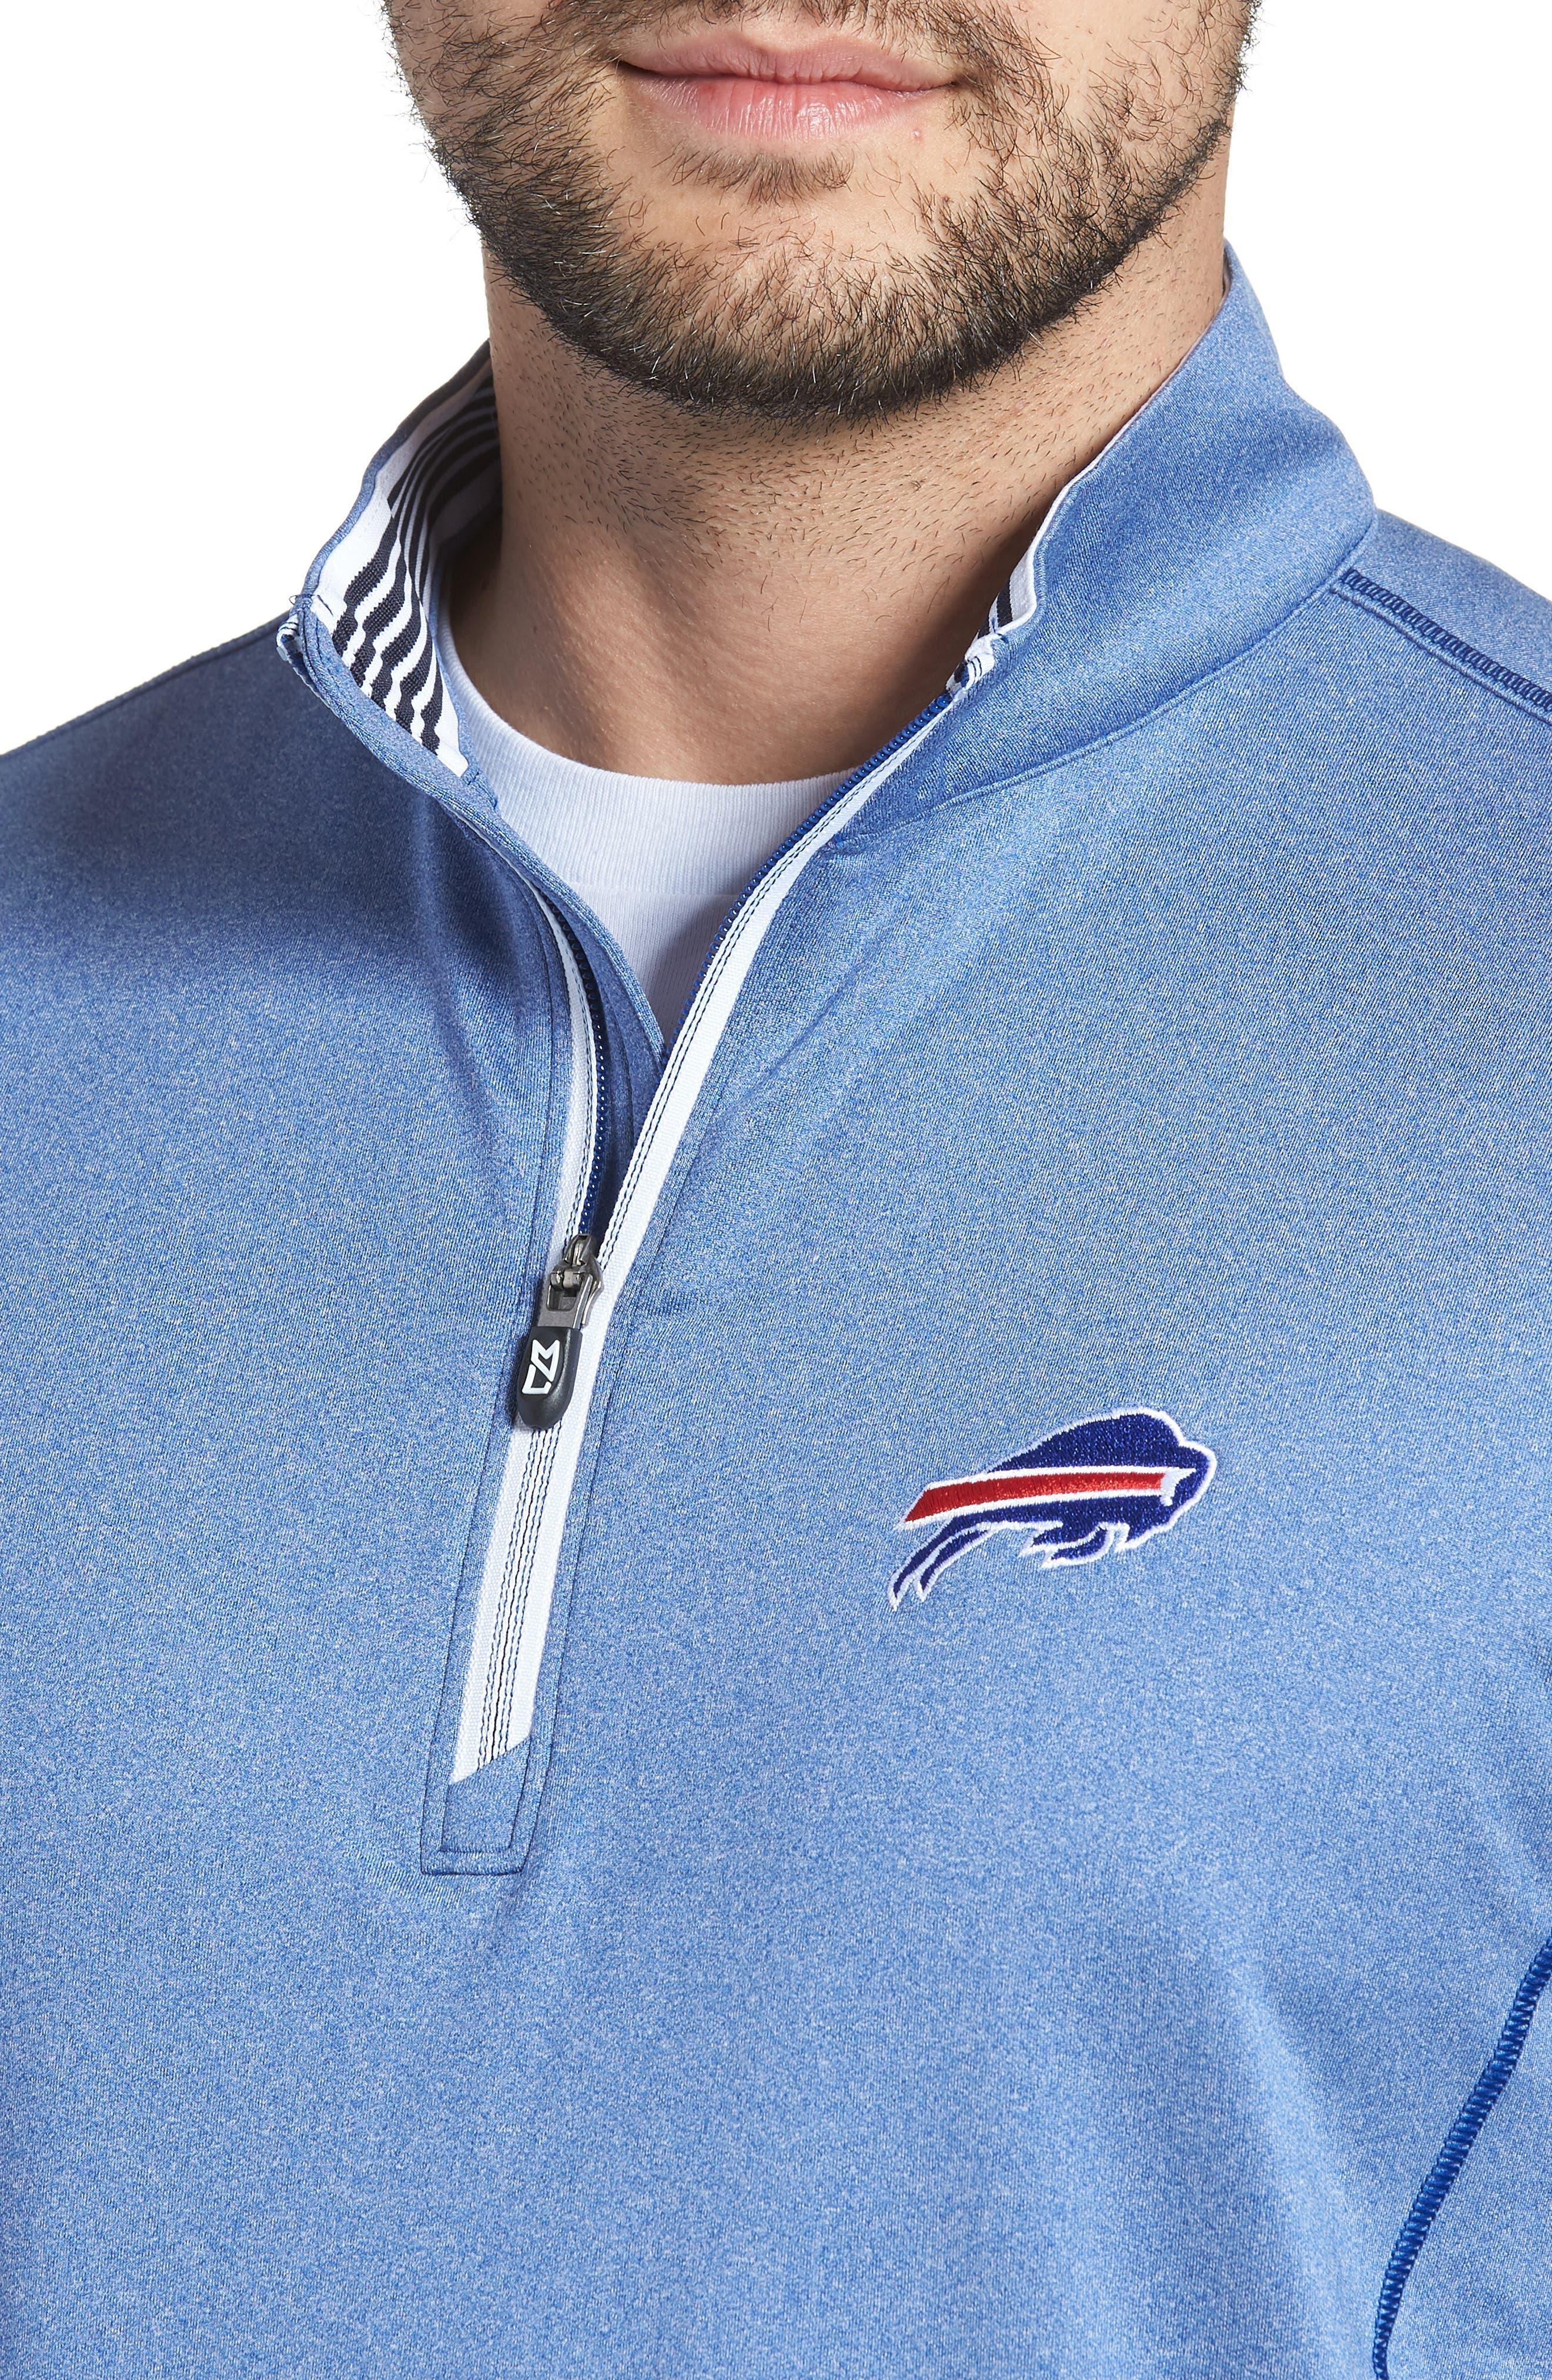 Endurance Buffalo Bills Regular Fit Pullover,                             Alternate thumbnail 4, color,                             TOUR BLUE HEATHER